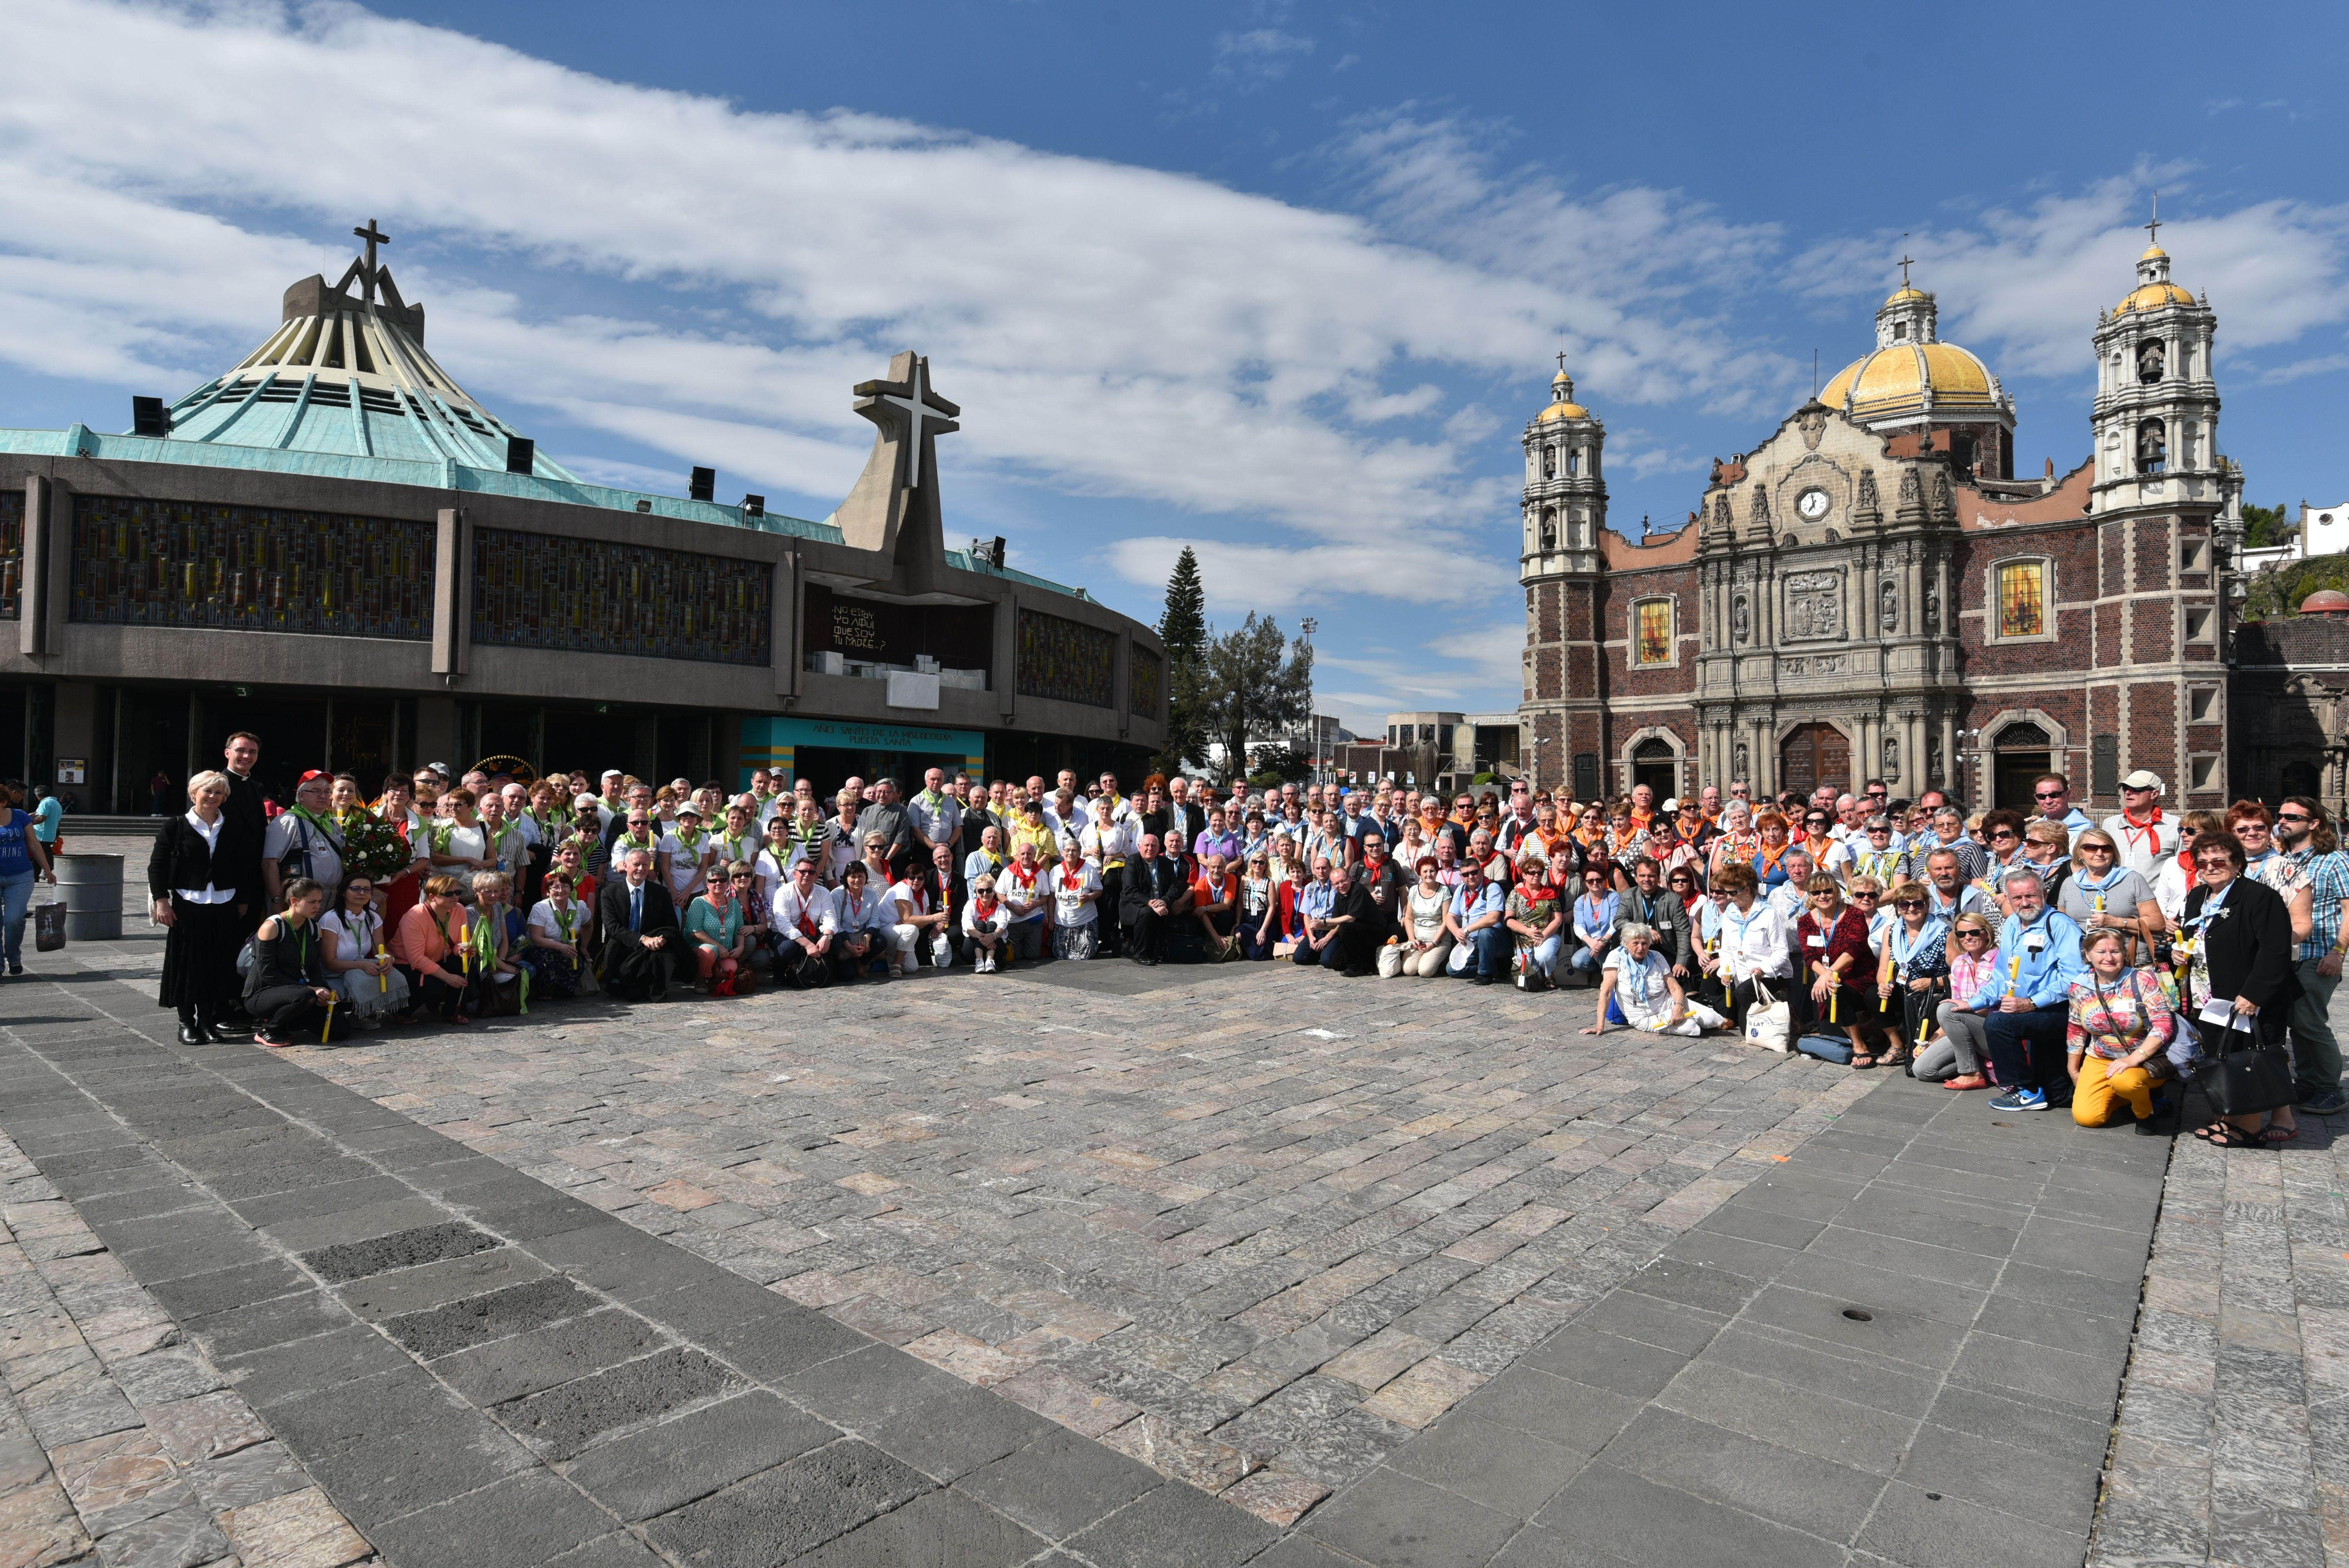 Pin by alicja jurasz on meksyk Landmarks, Travel, Building